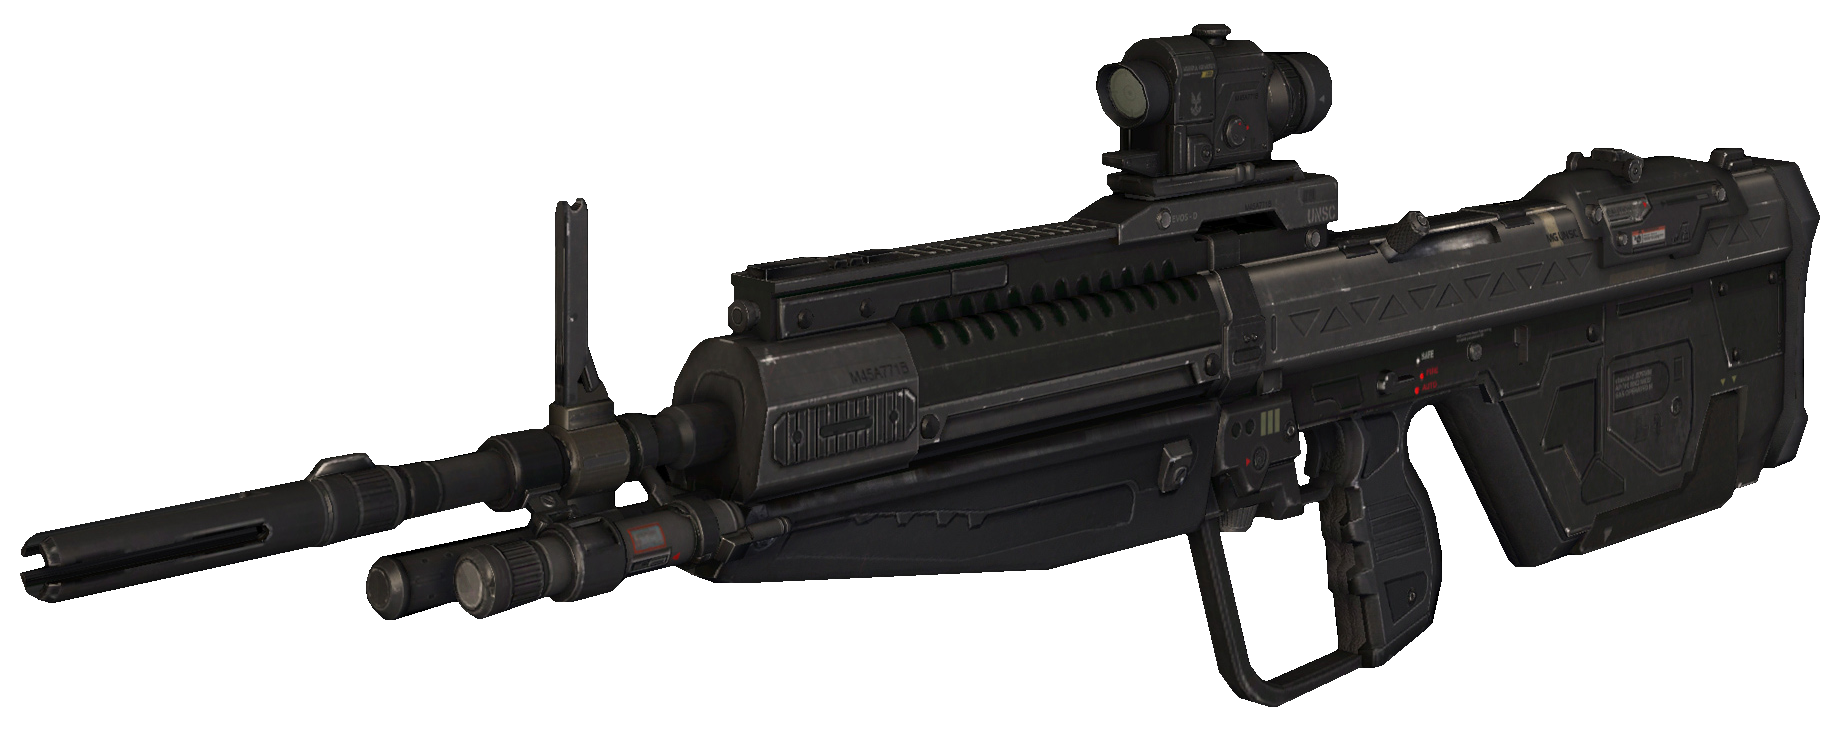 M395 Designated Marksman Rifle (Halo 4) | Gunfaceoff Wiki | Fandom ...